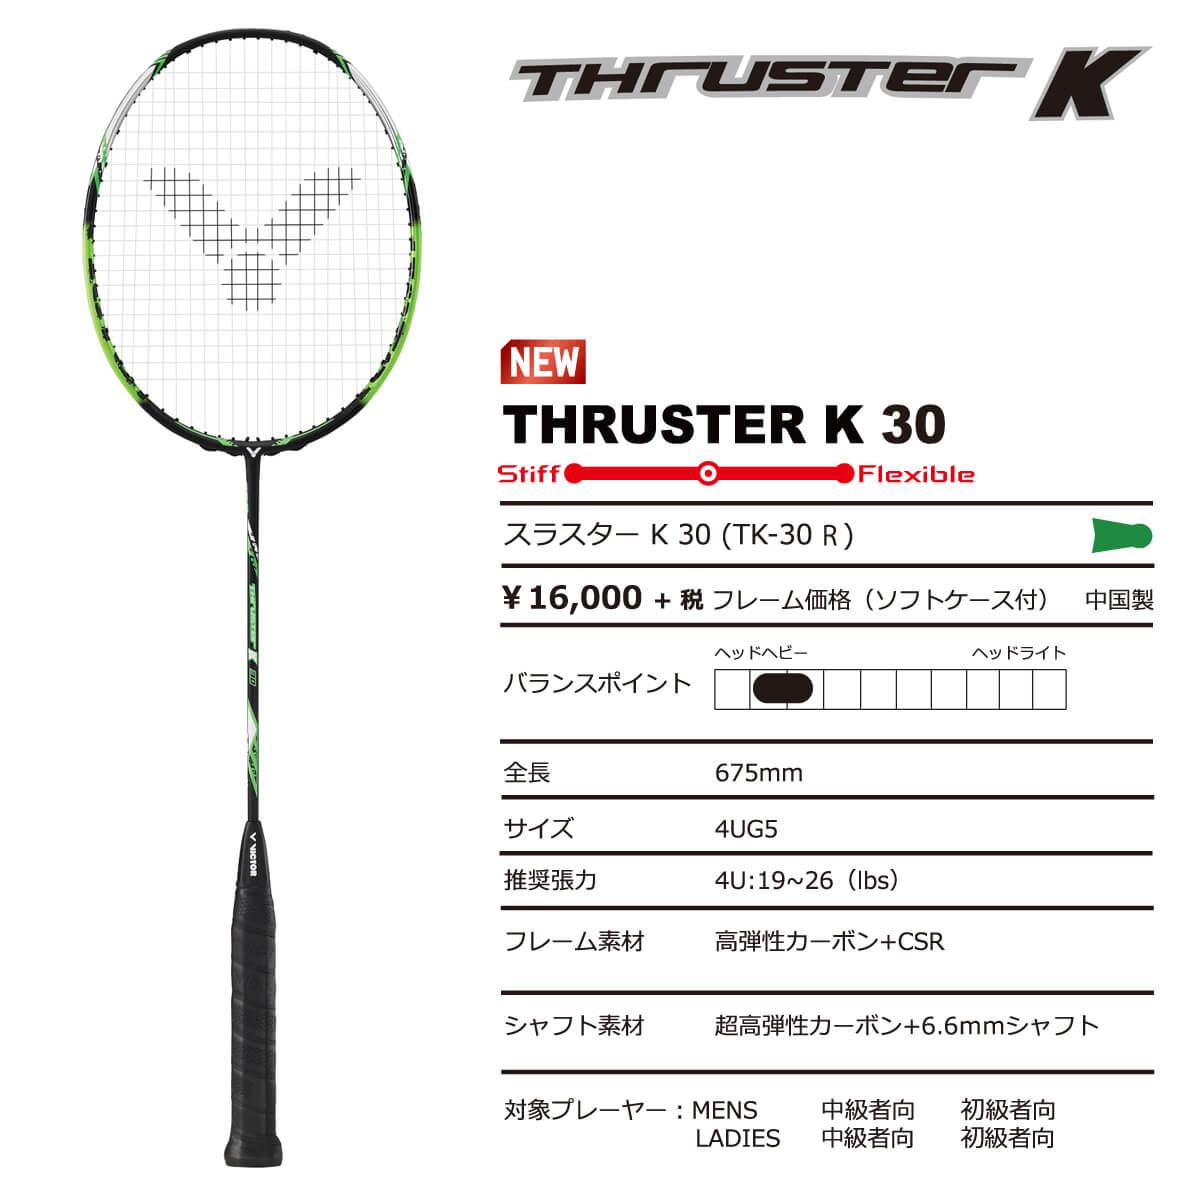 VICTOR THRUSTER K 30 スラスター バドミントンラケット ビクター【日本バドミントン協会審査合格品/ 取り寄せ】